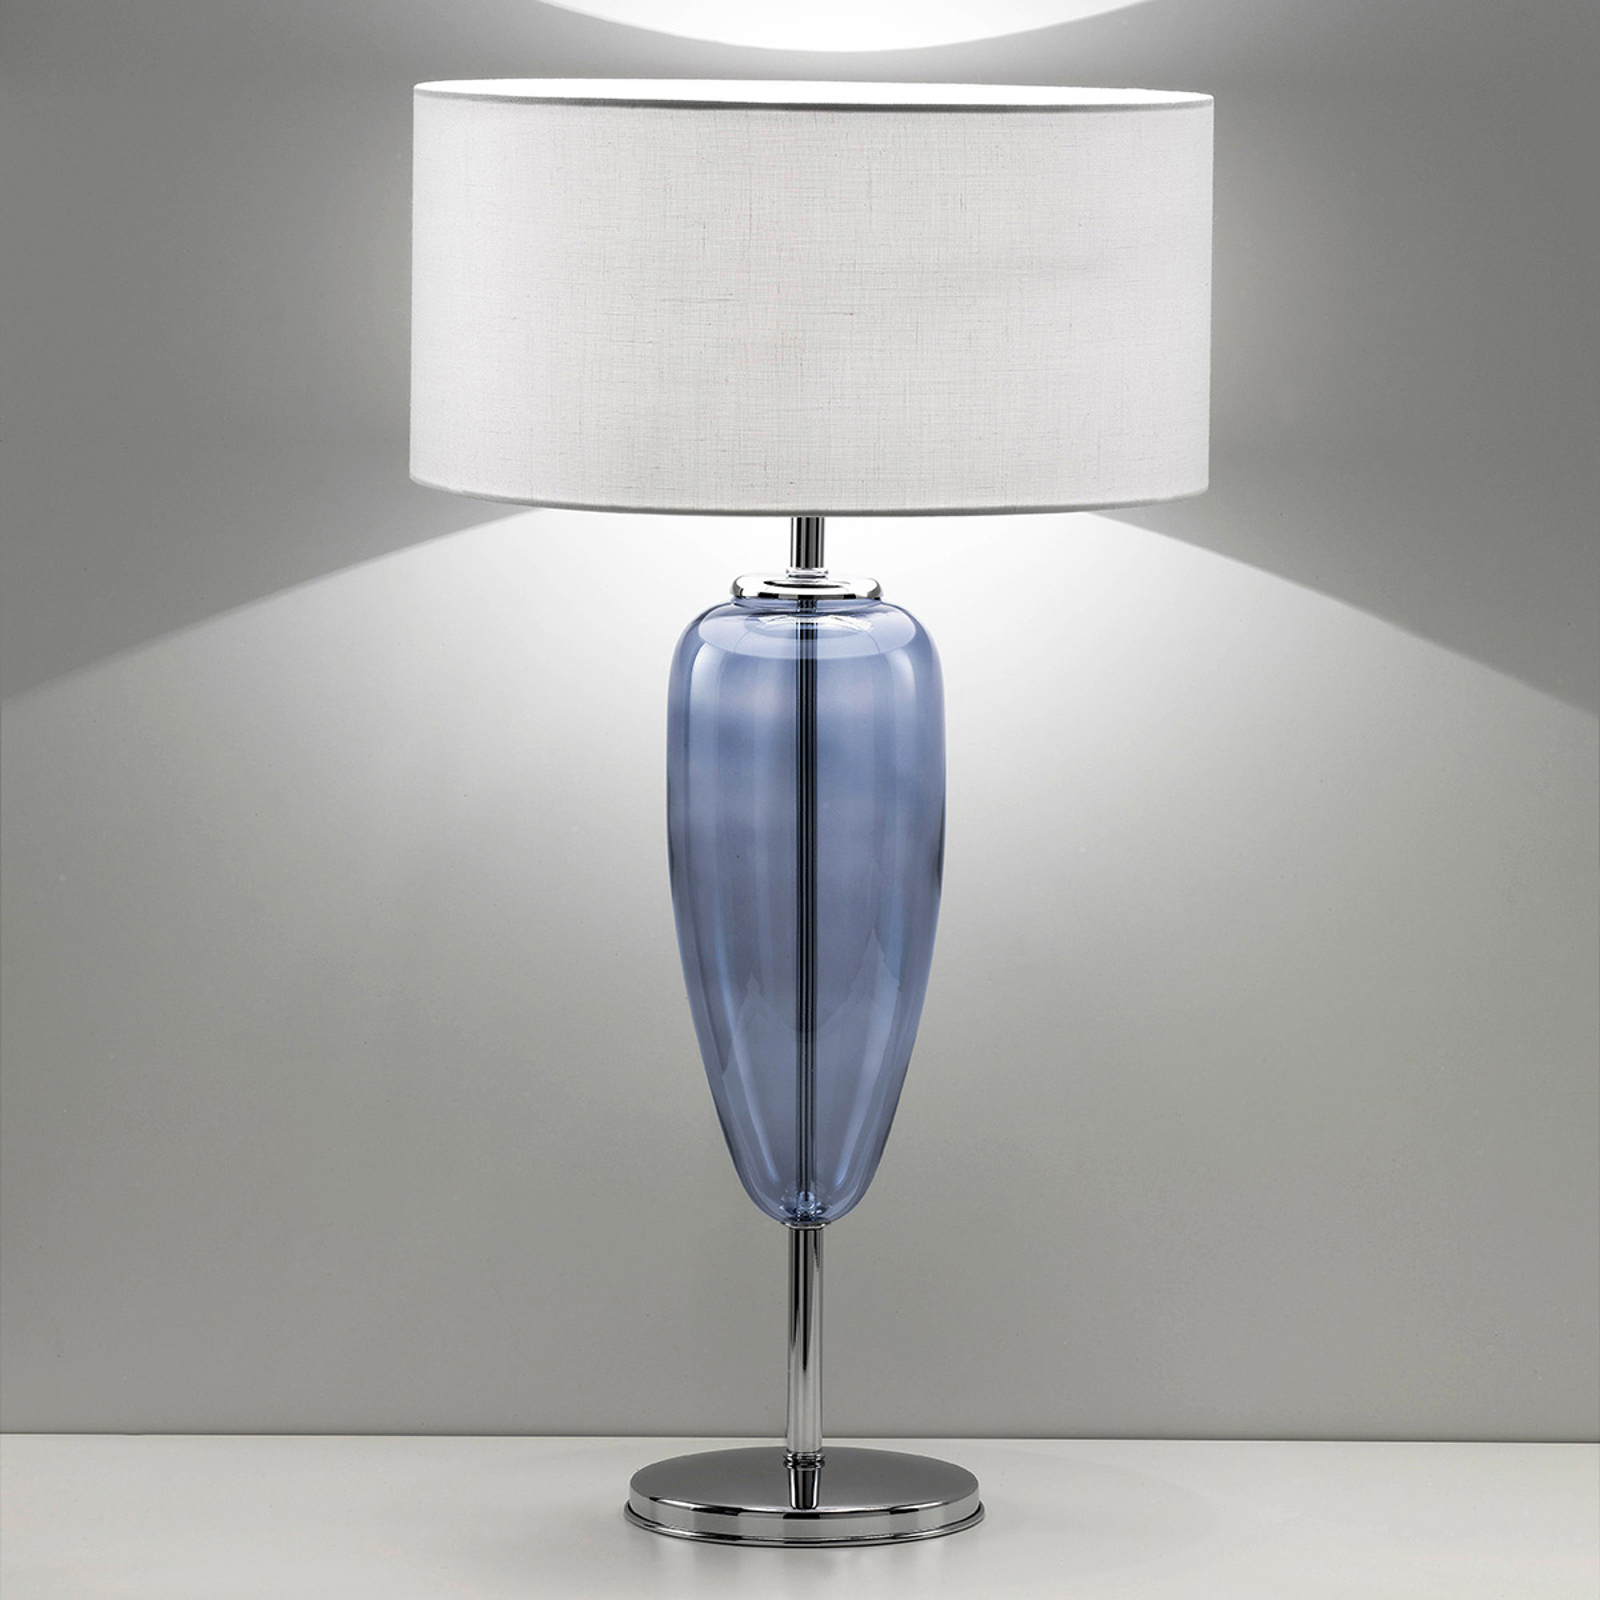 Tafellamp Show Ogiva 82 cm blauw glaselement